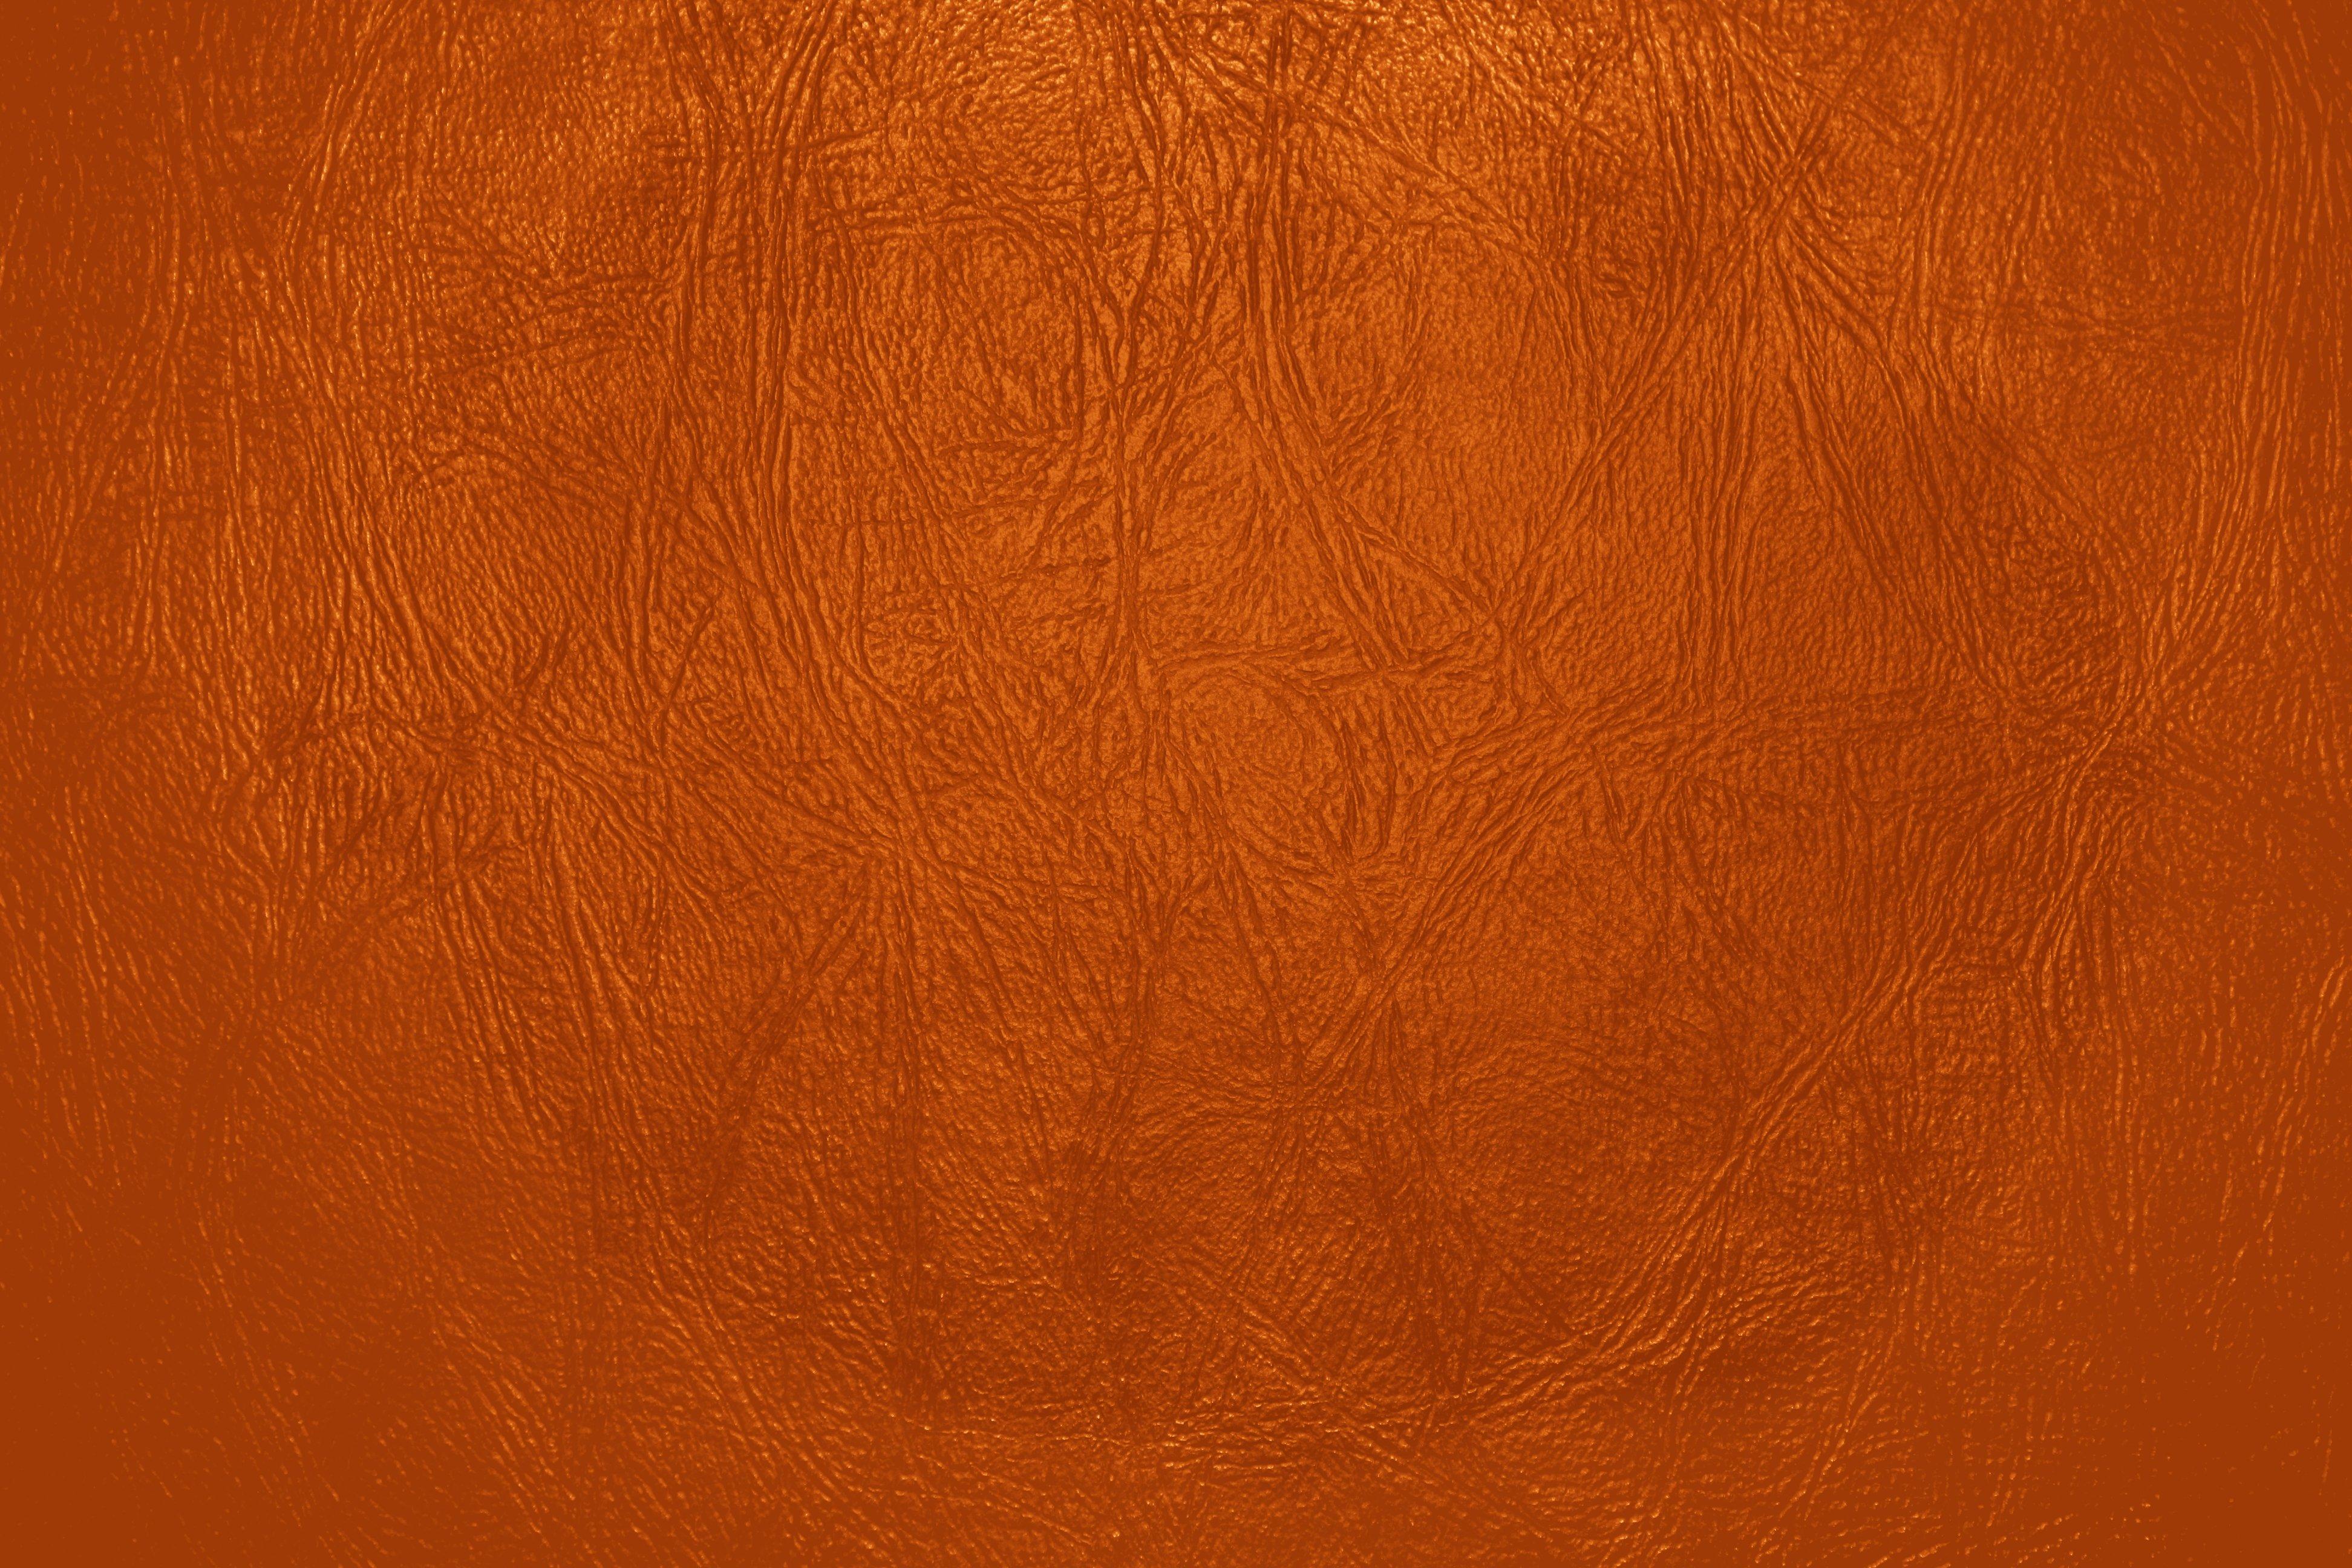 Orange Leather Close Up Texture Picture | Free Photograph | Photos ...